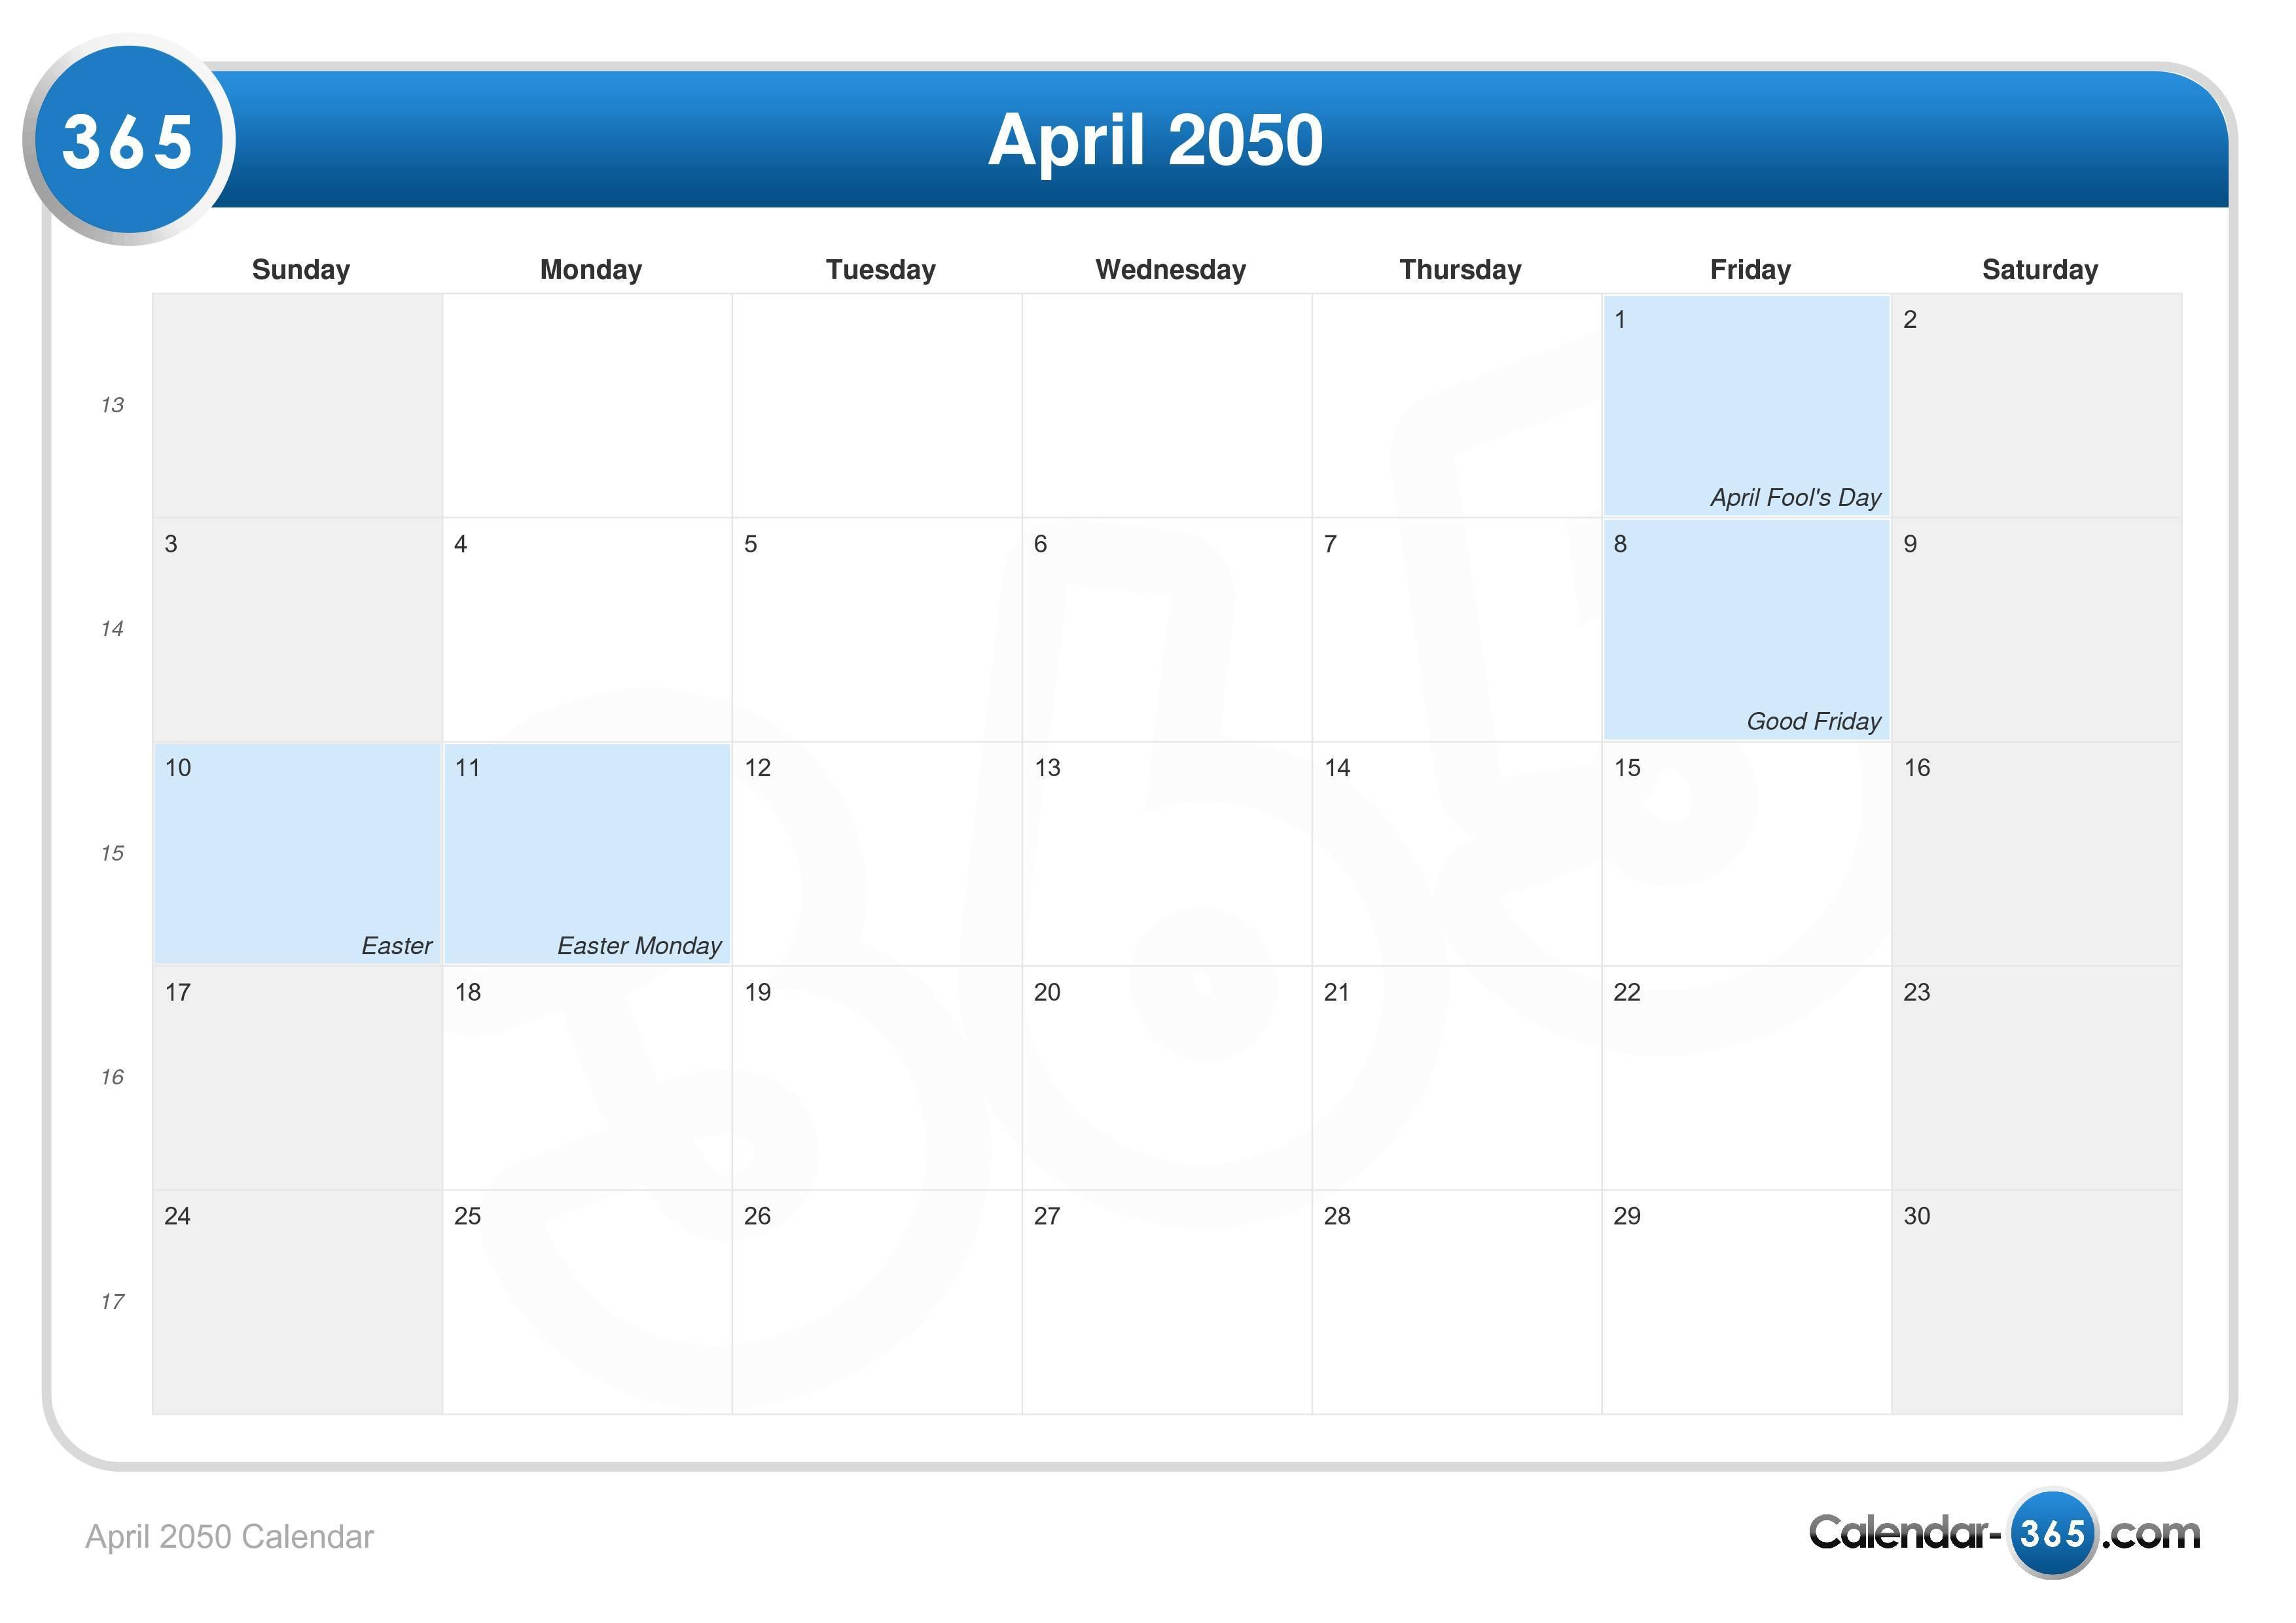 Perpetual Calendar 1800 To 2050 : Calendar